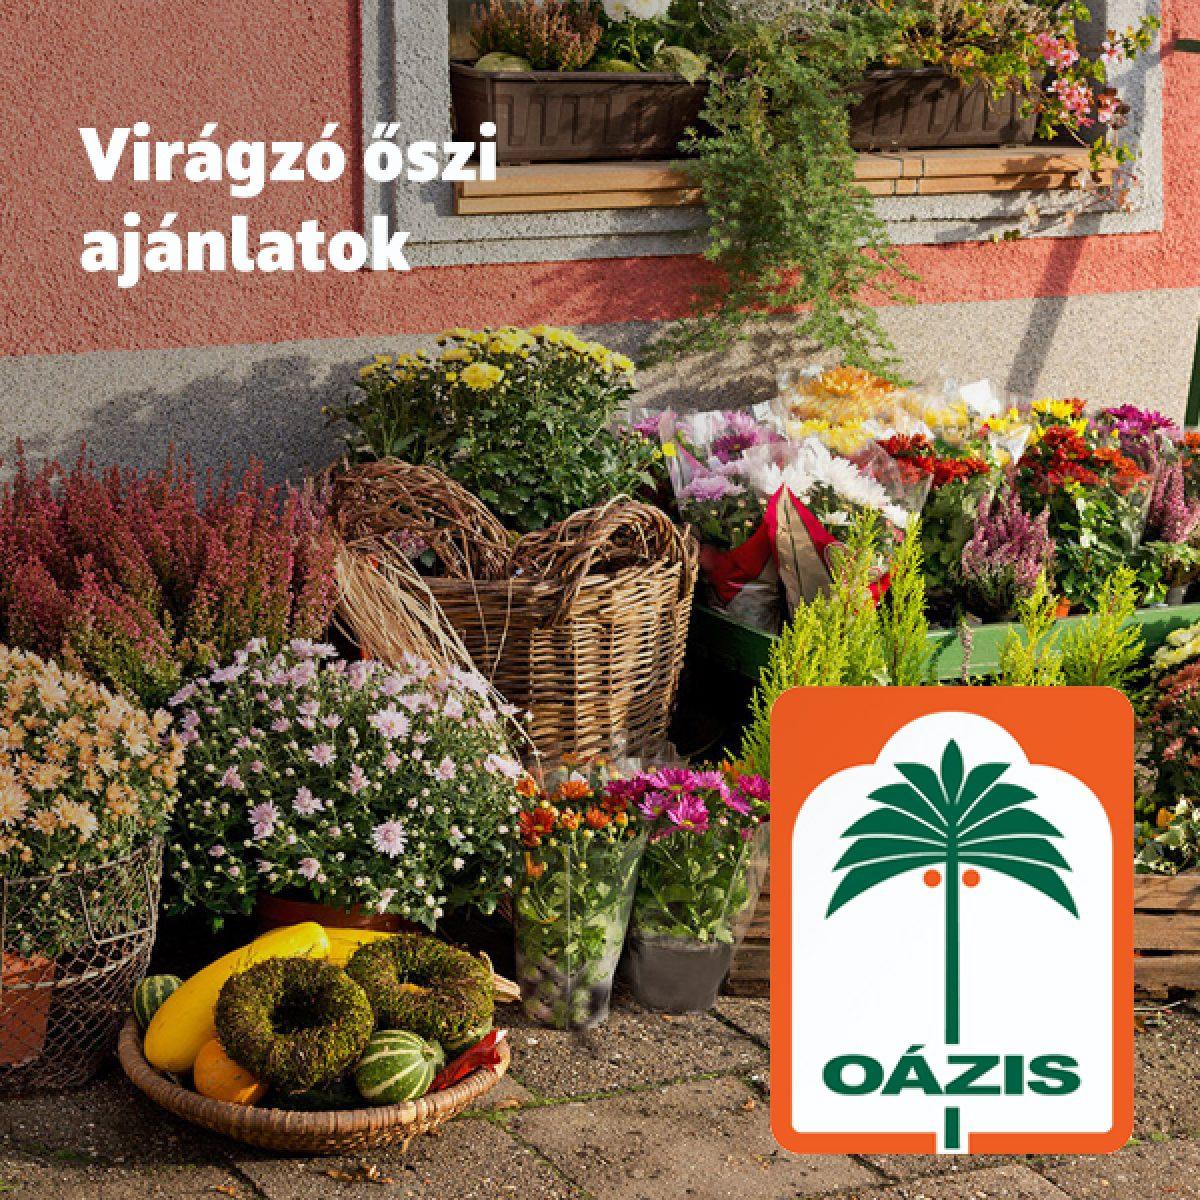 oazis_akcio_04